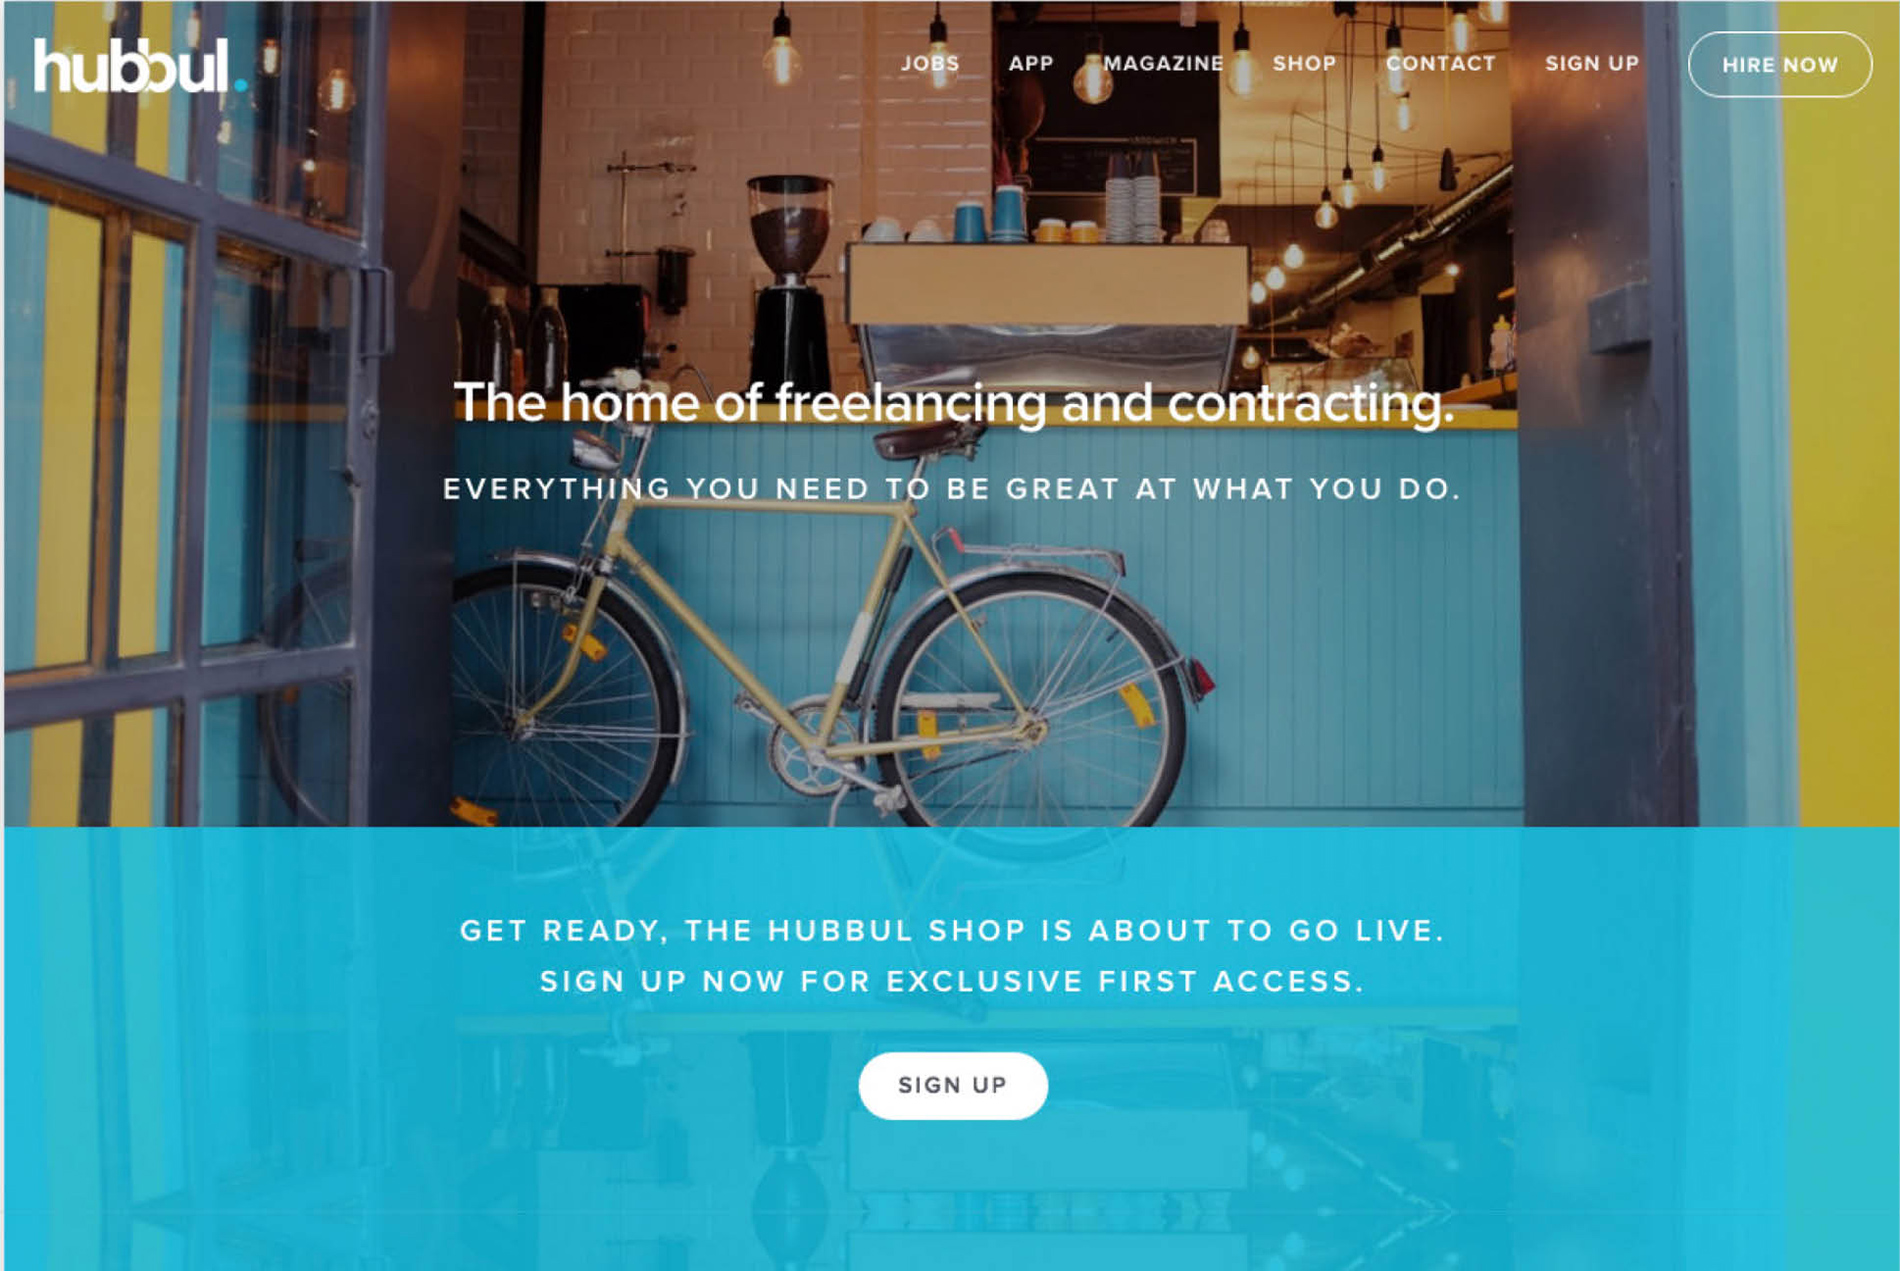 hubbul website   Branding, Strategy and Logo Design   Independent Marketing   IM London   London Branding Agency